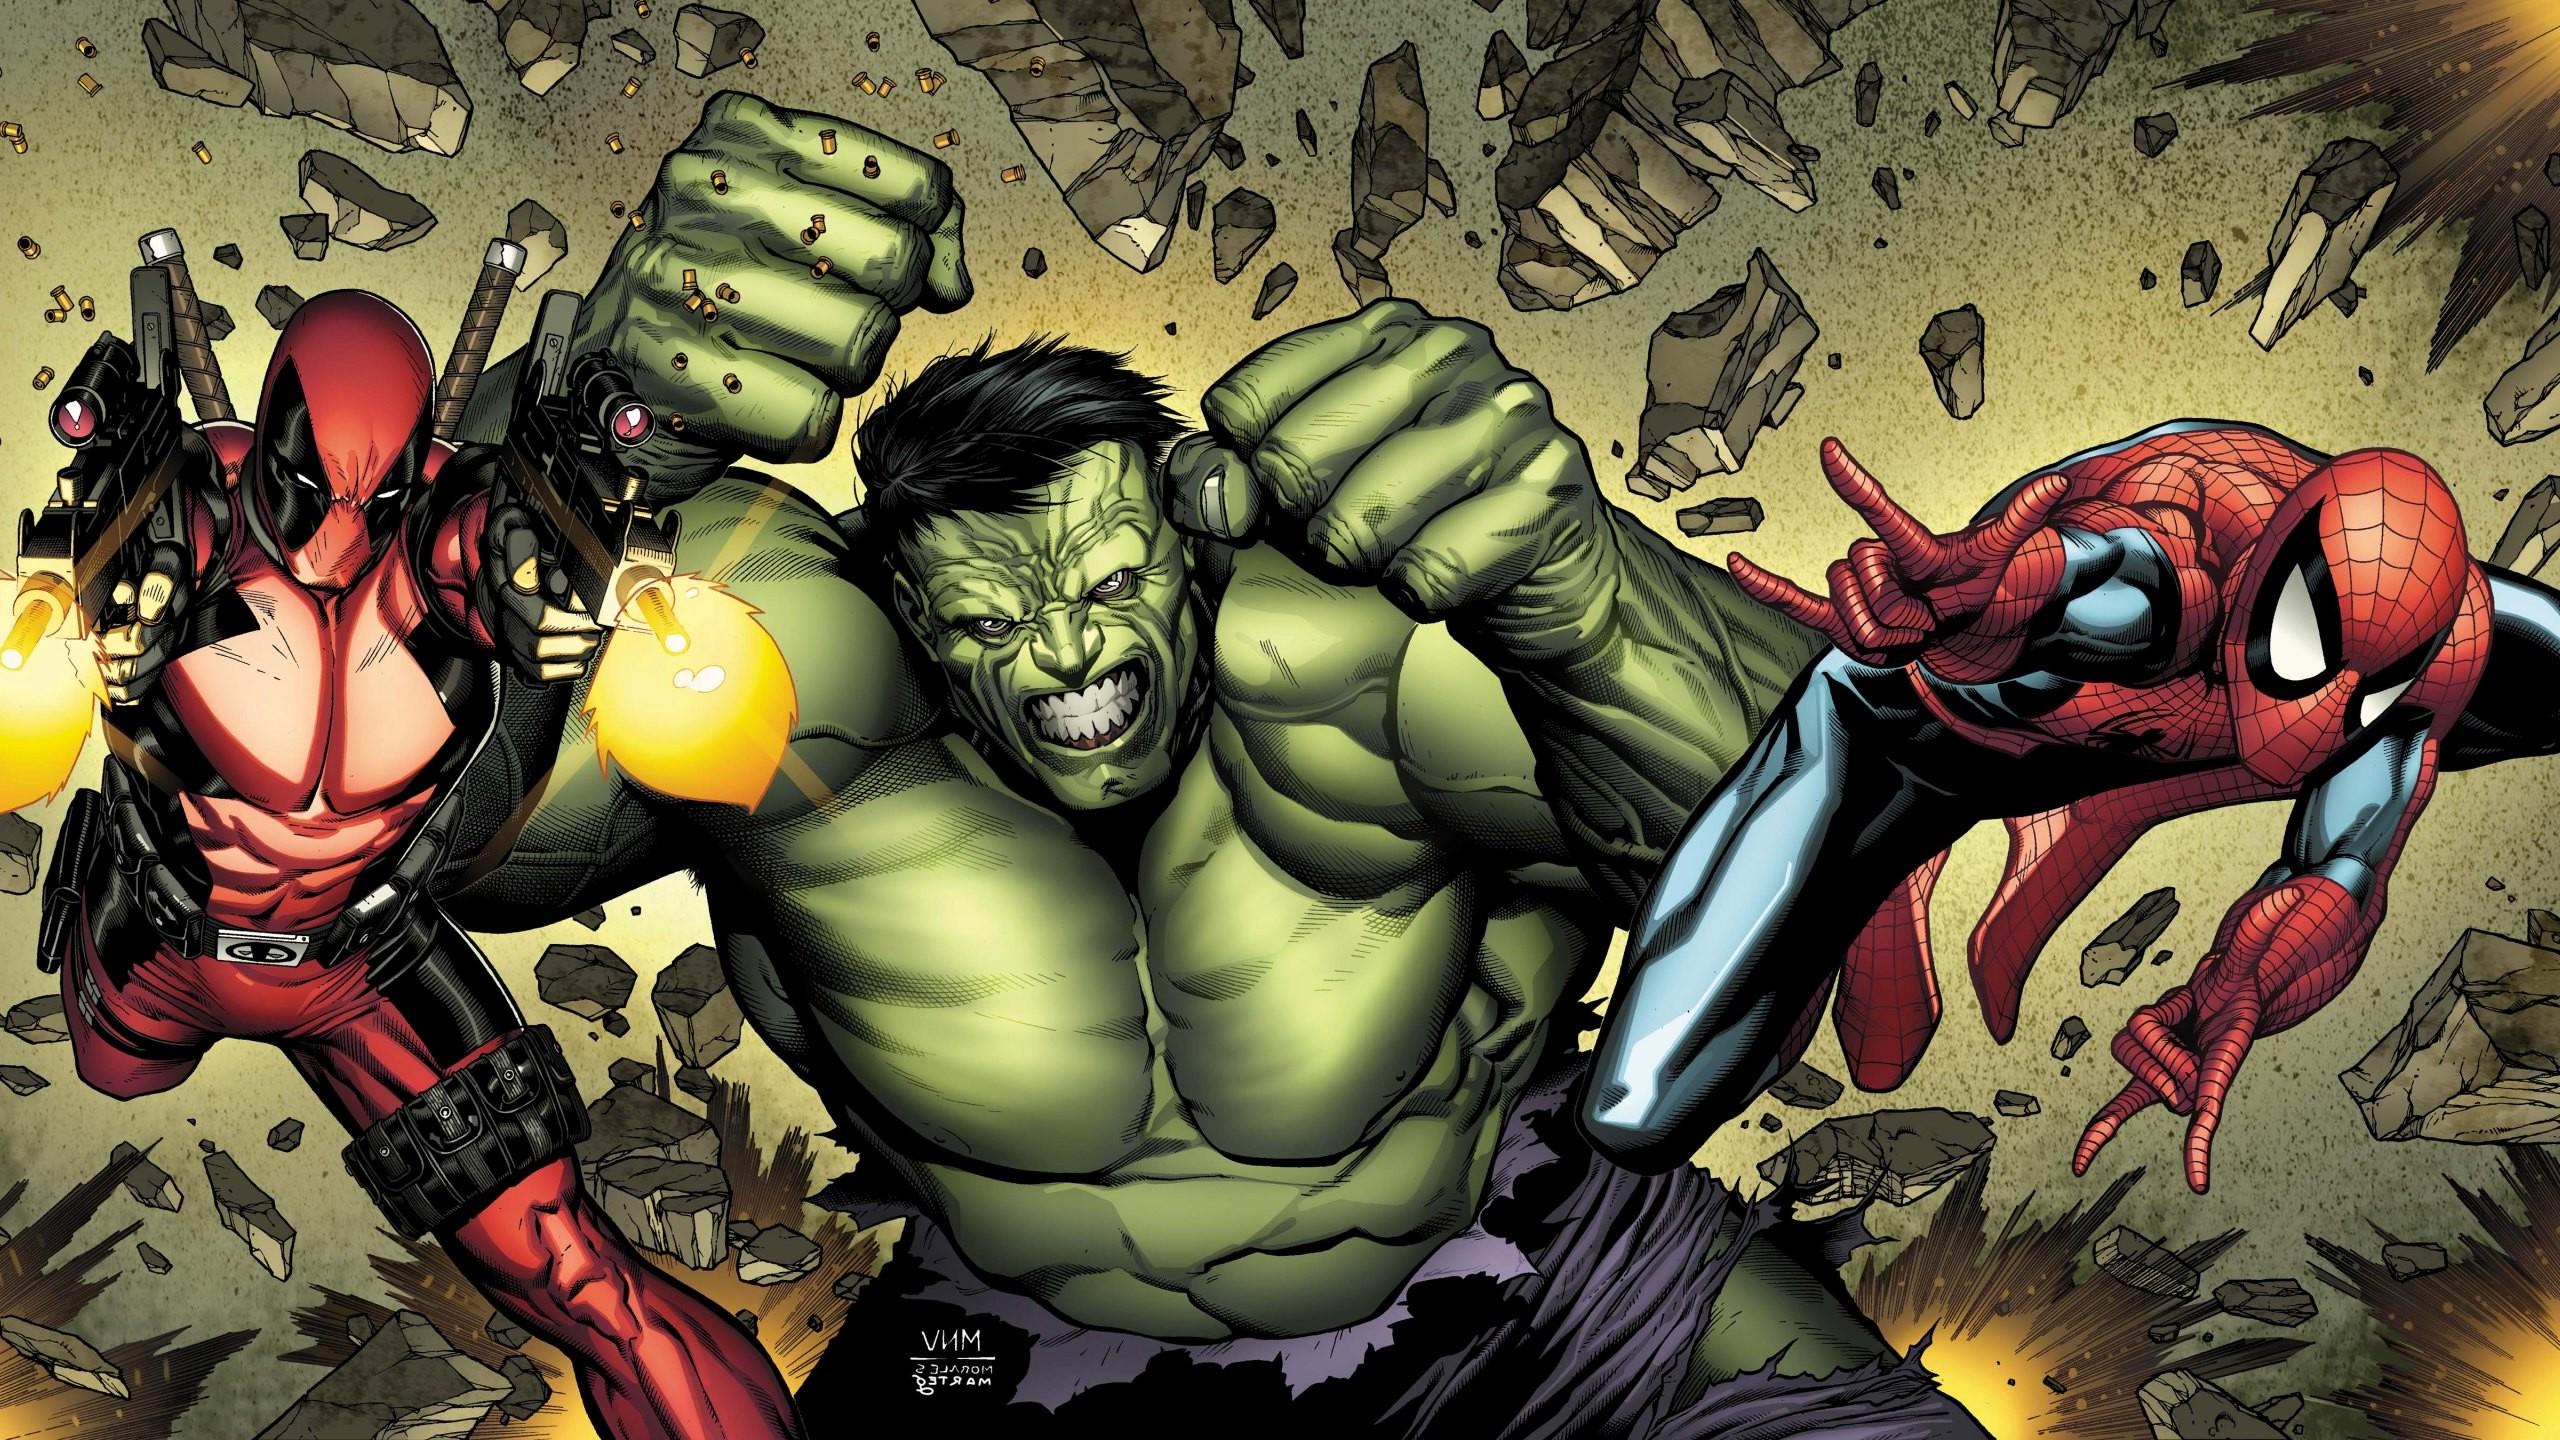 Hero Superhero Marvel Comics Hulk Captain America Spider Man Deadpool 2560x1440 Px Computer Wallpaper Fictional